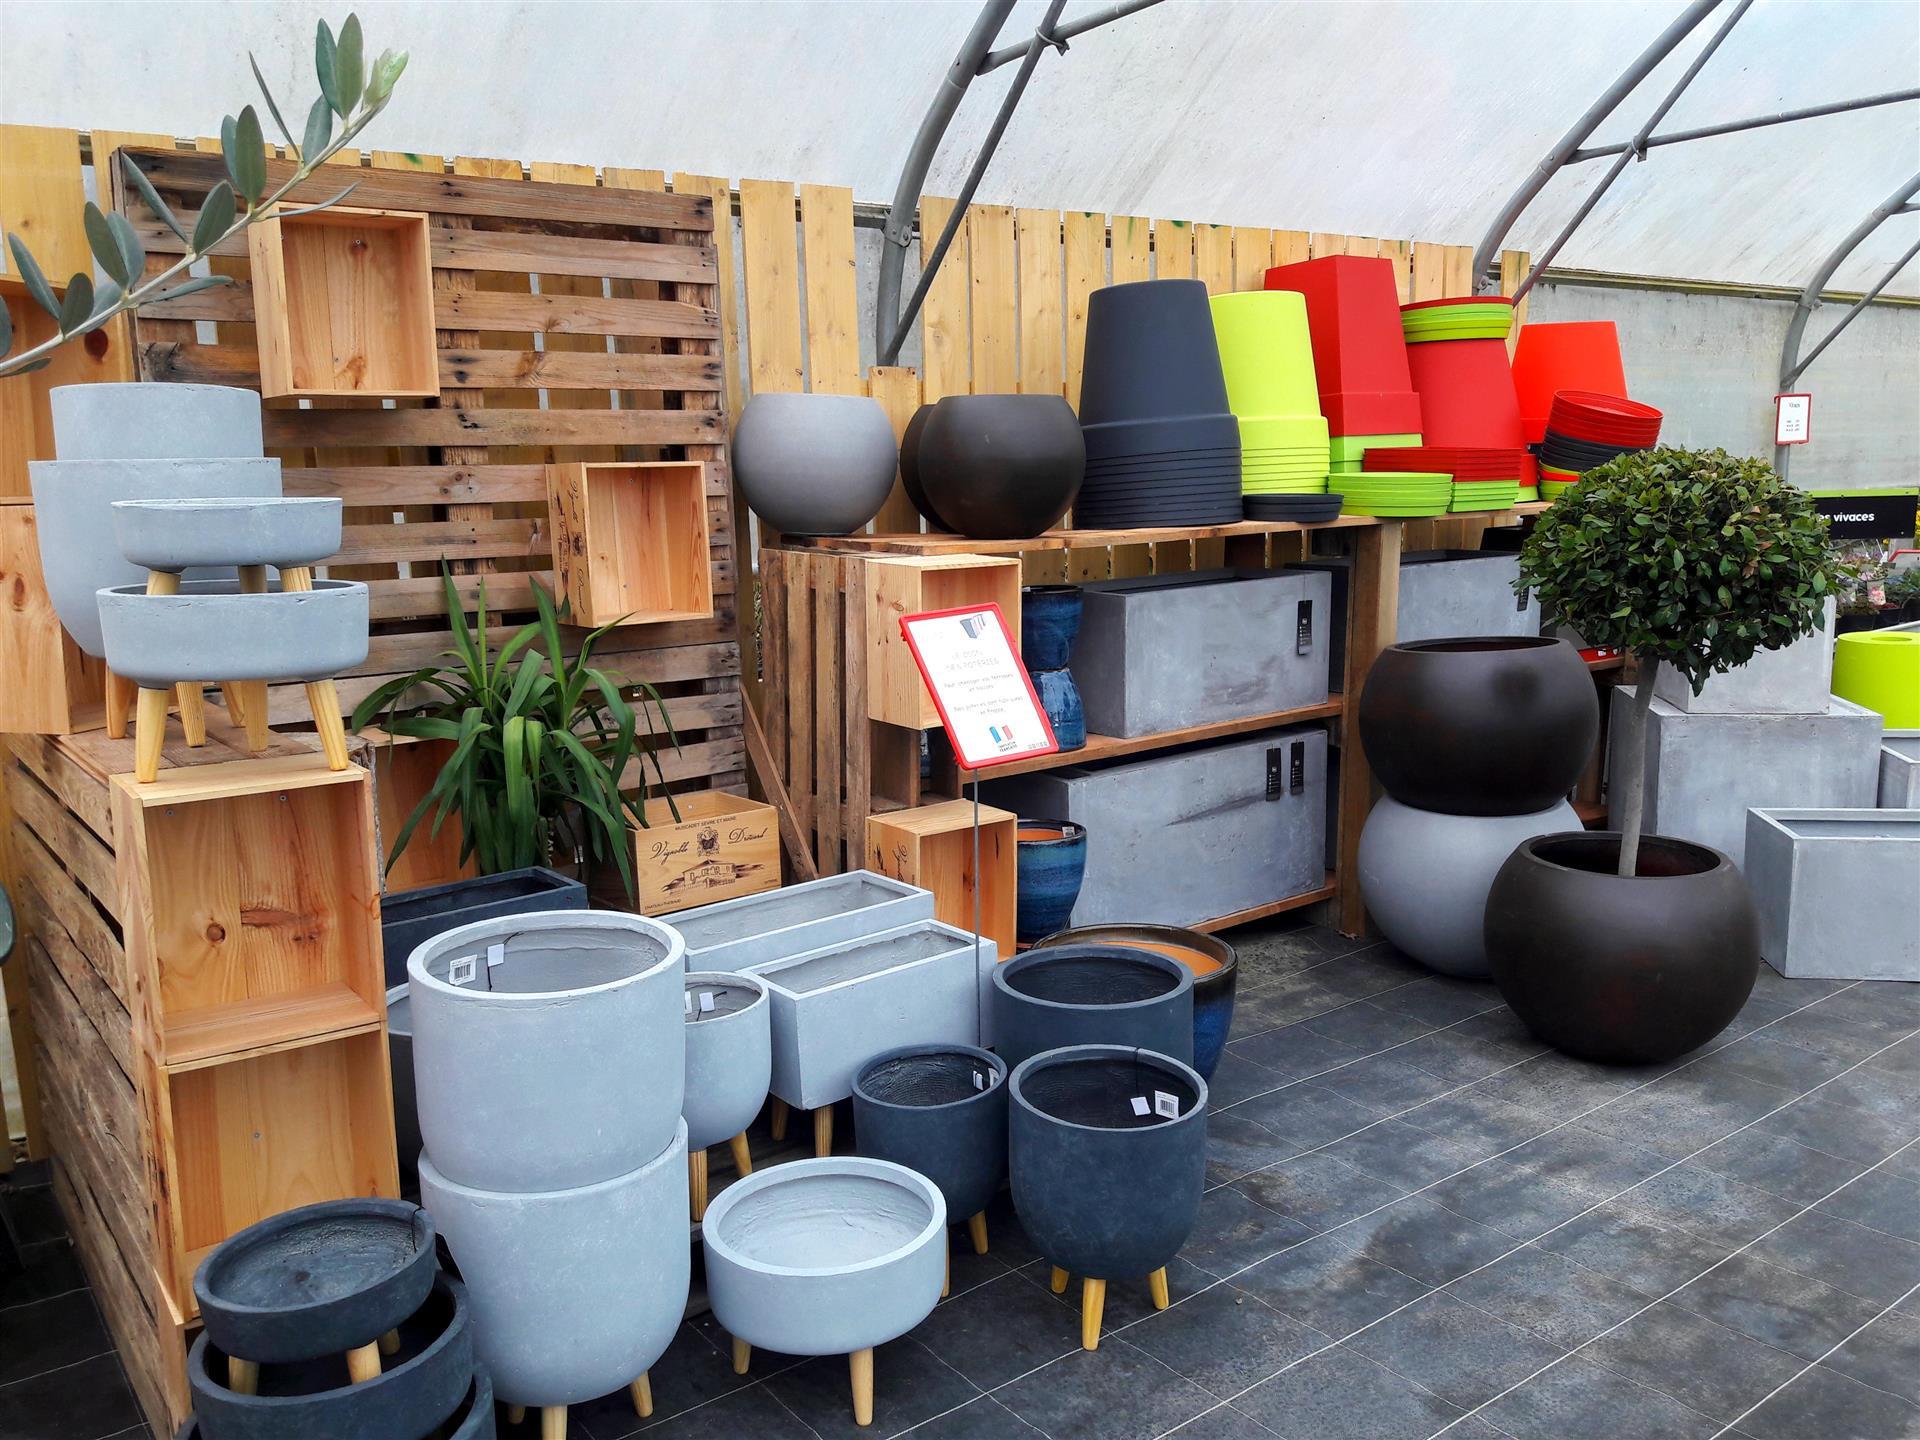 pots et jardinieres. Black Bedroom Furniture Sets. Home Design Ideas